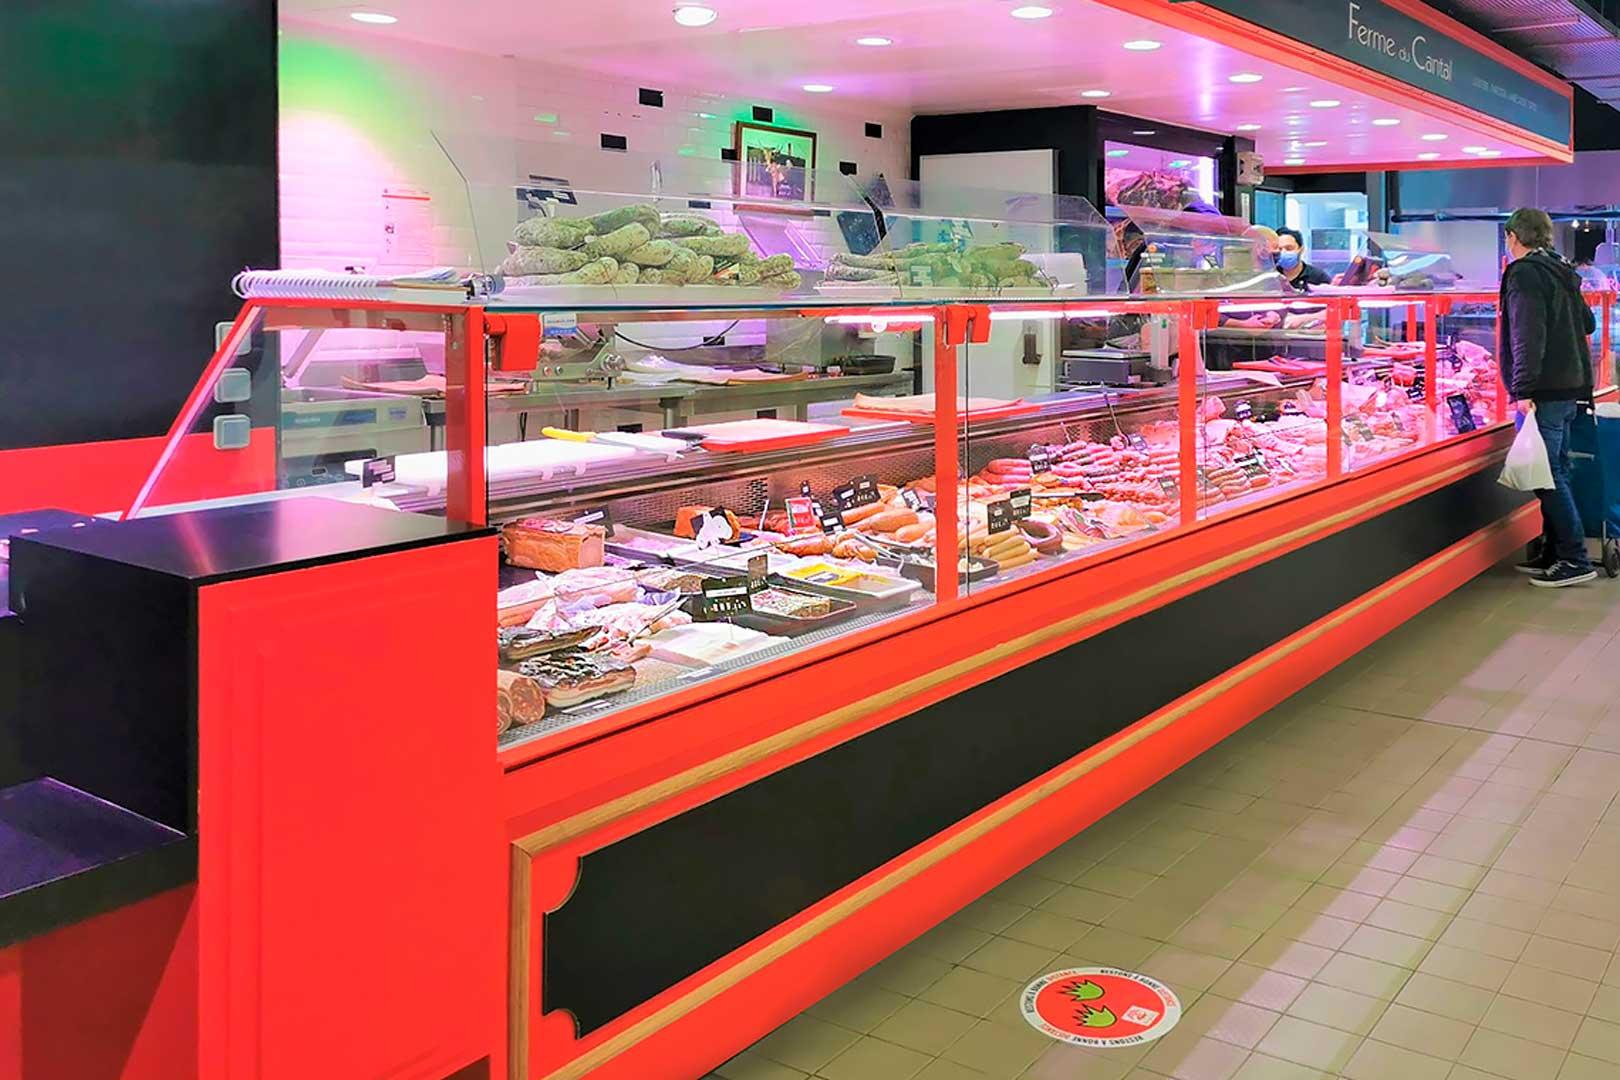 Refrigerated counters Missouri MC 120 M, minimarket LA FERME DU CANTAL in France